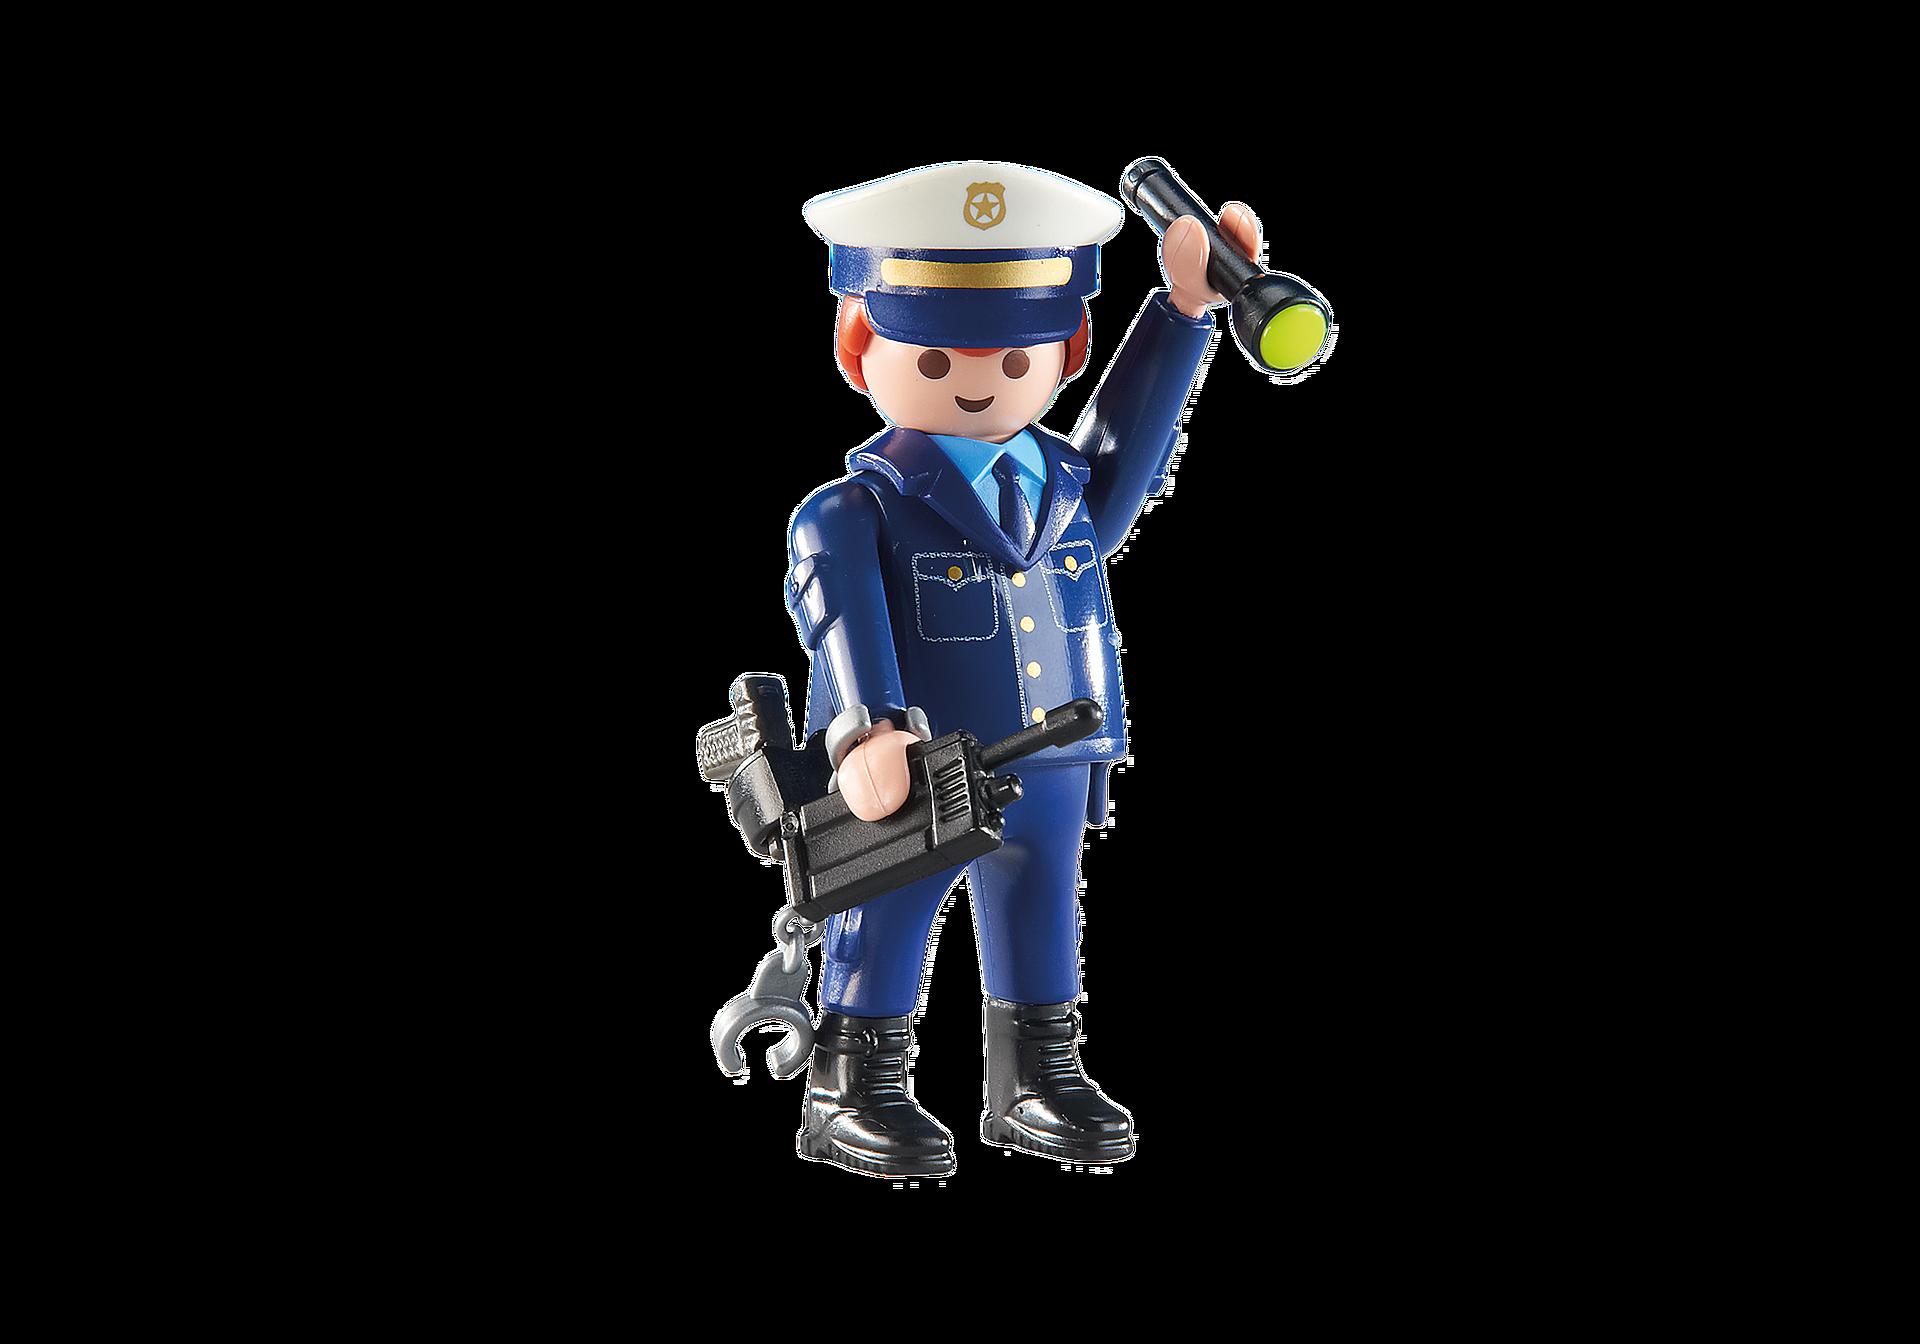 http://media.playmobil.com/i/playmobil/6502_product_detail/Αρχηγός αστυνομίας